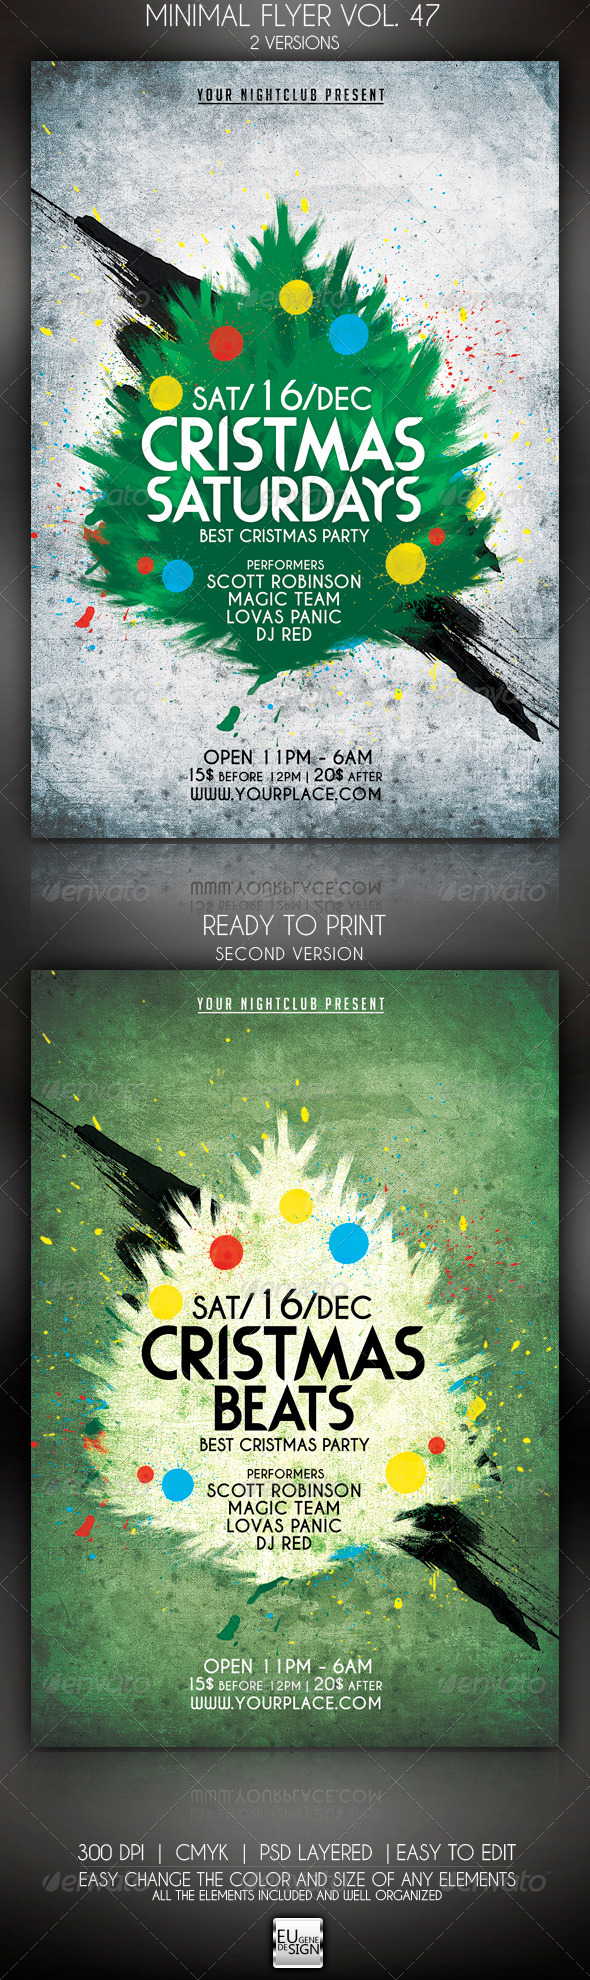 Minimal Flyer Vol. 47 - Clubs & Parties Events